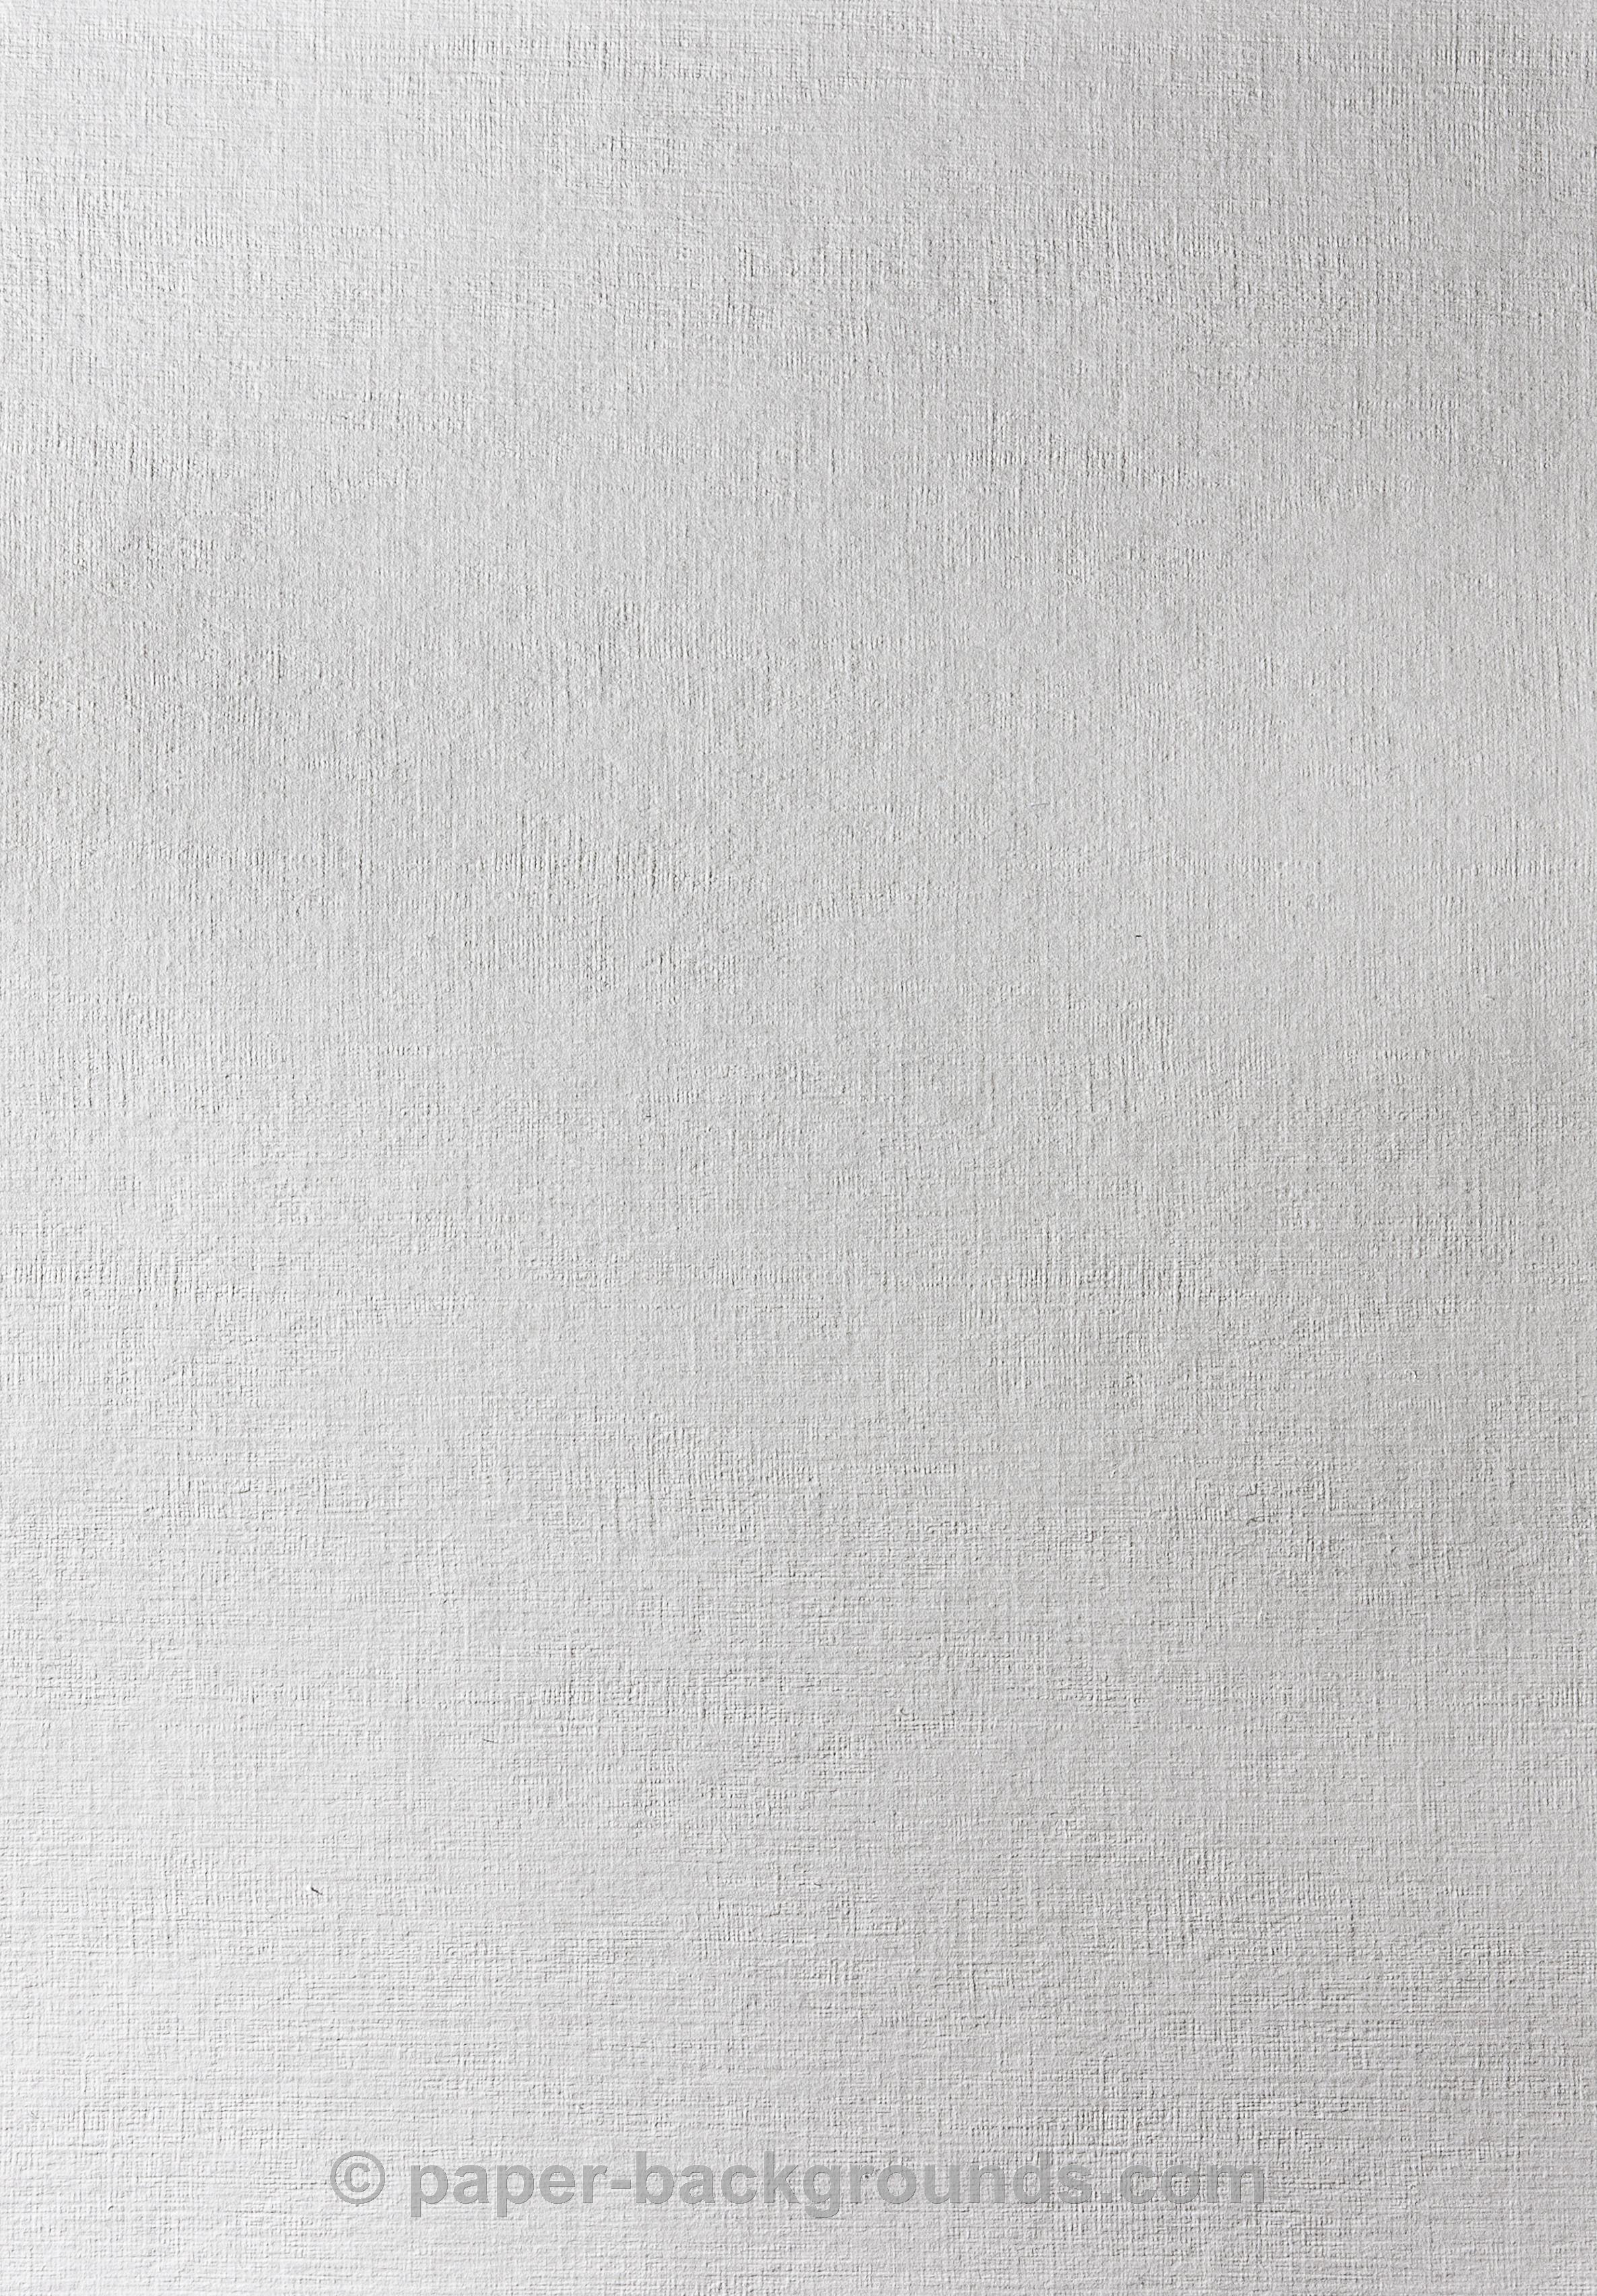 Natural-Paper-Background-Texture.jpg - Frank Marino Baker - Drip ...